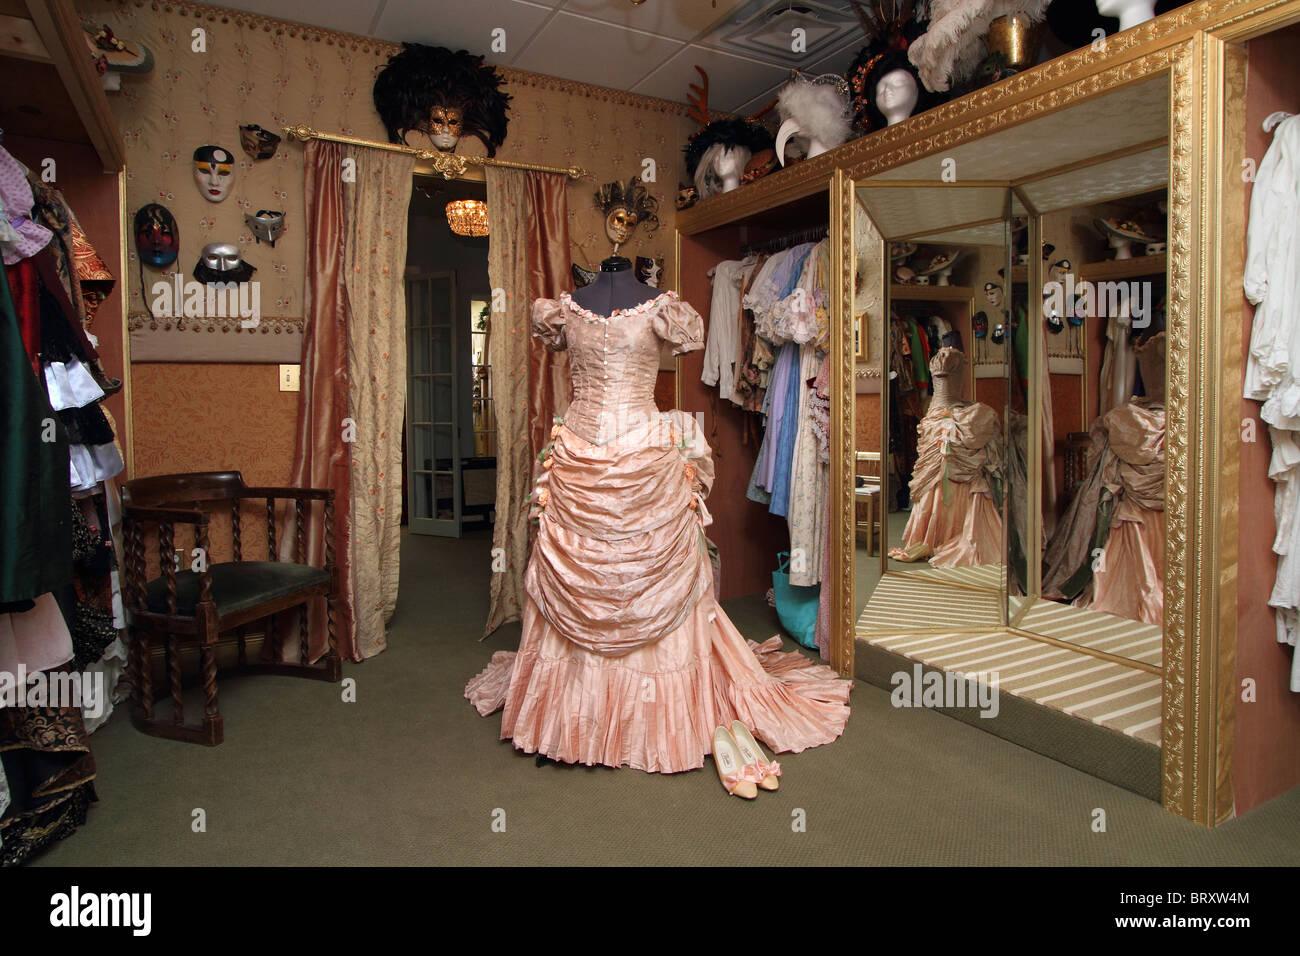 ballkleid 18 19 jahrhundert shop